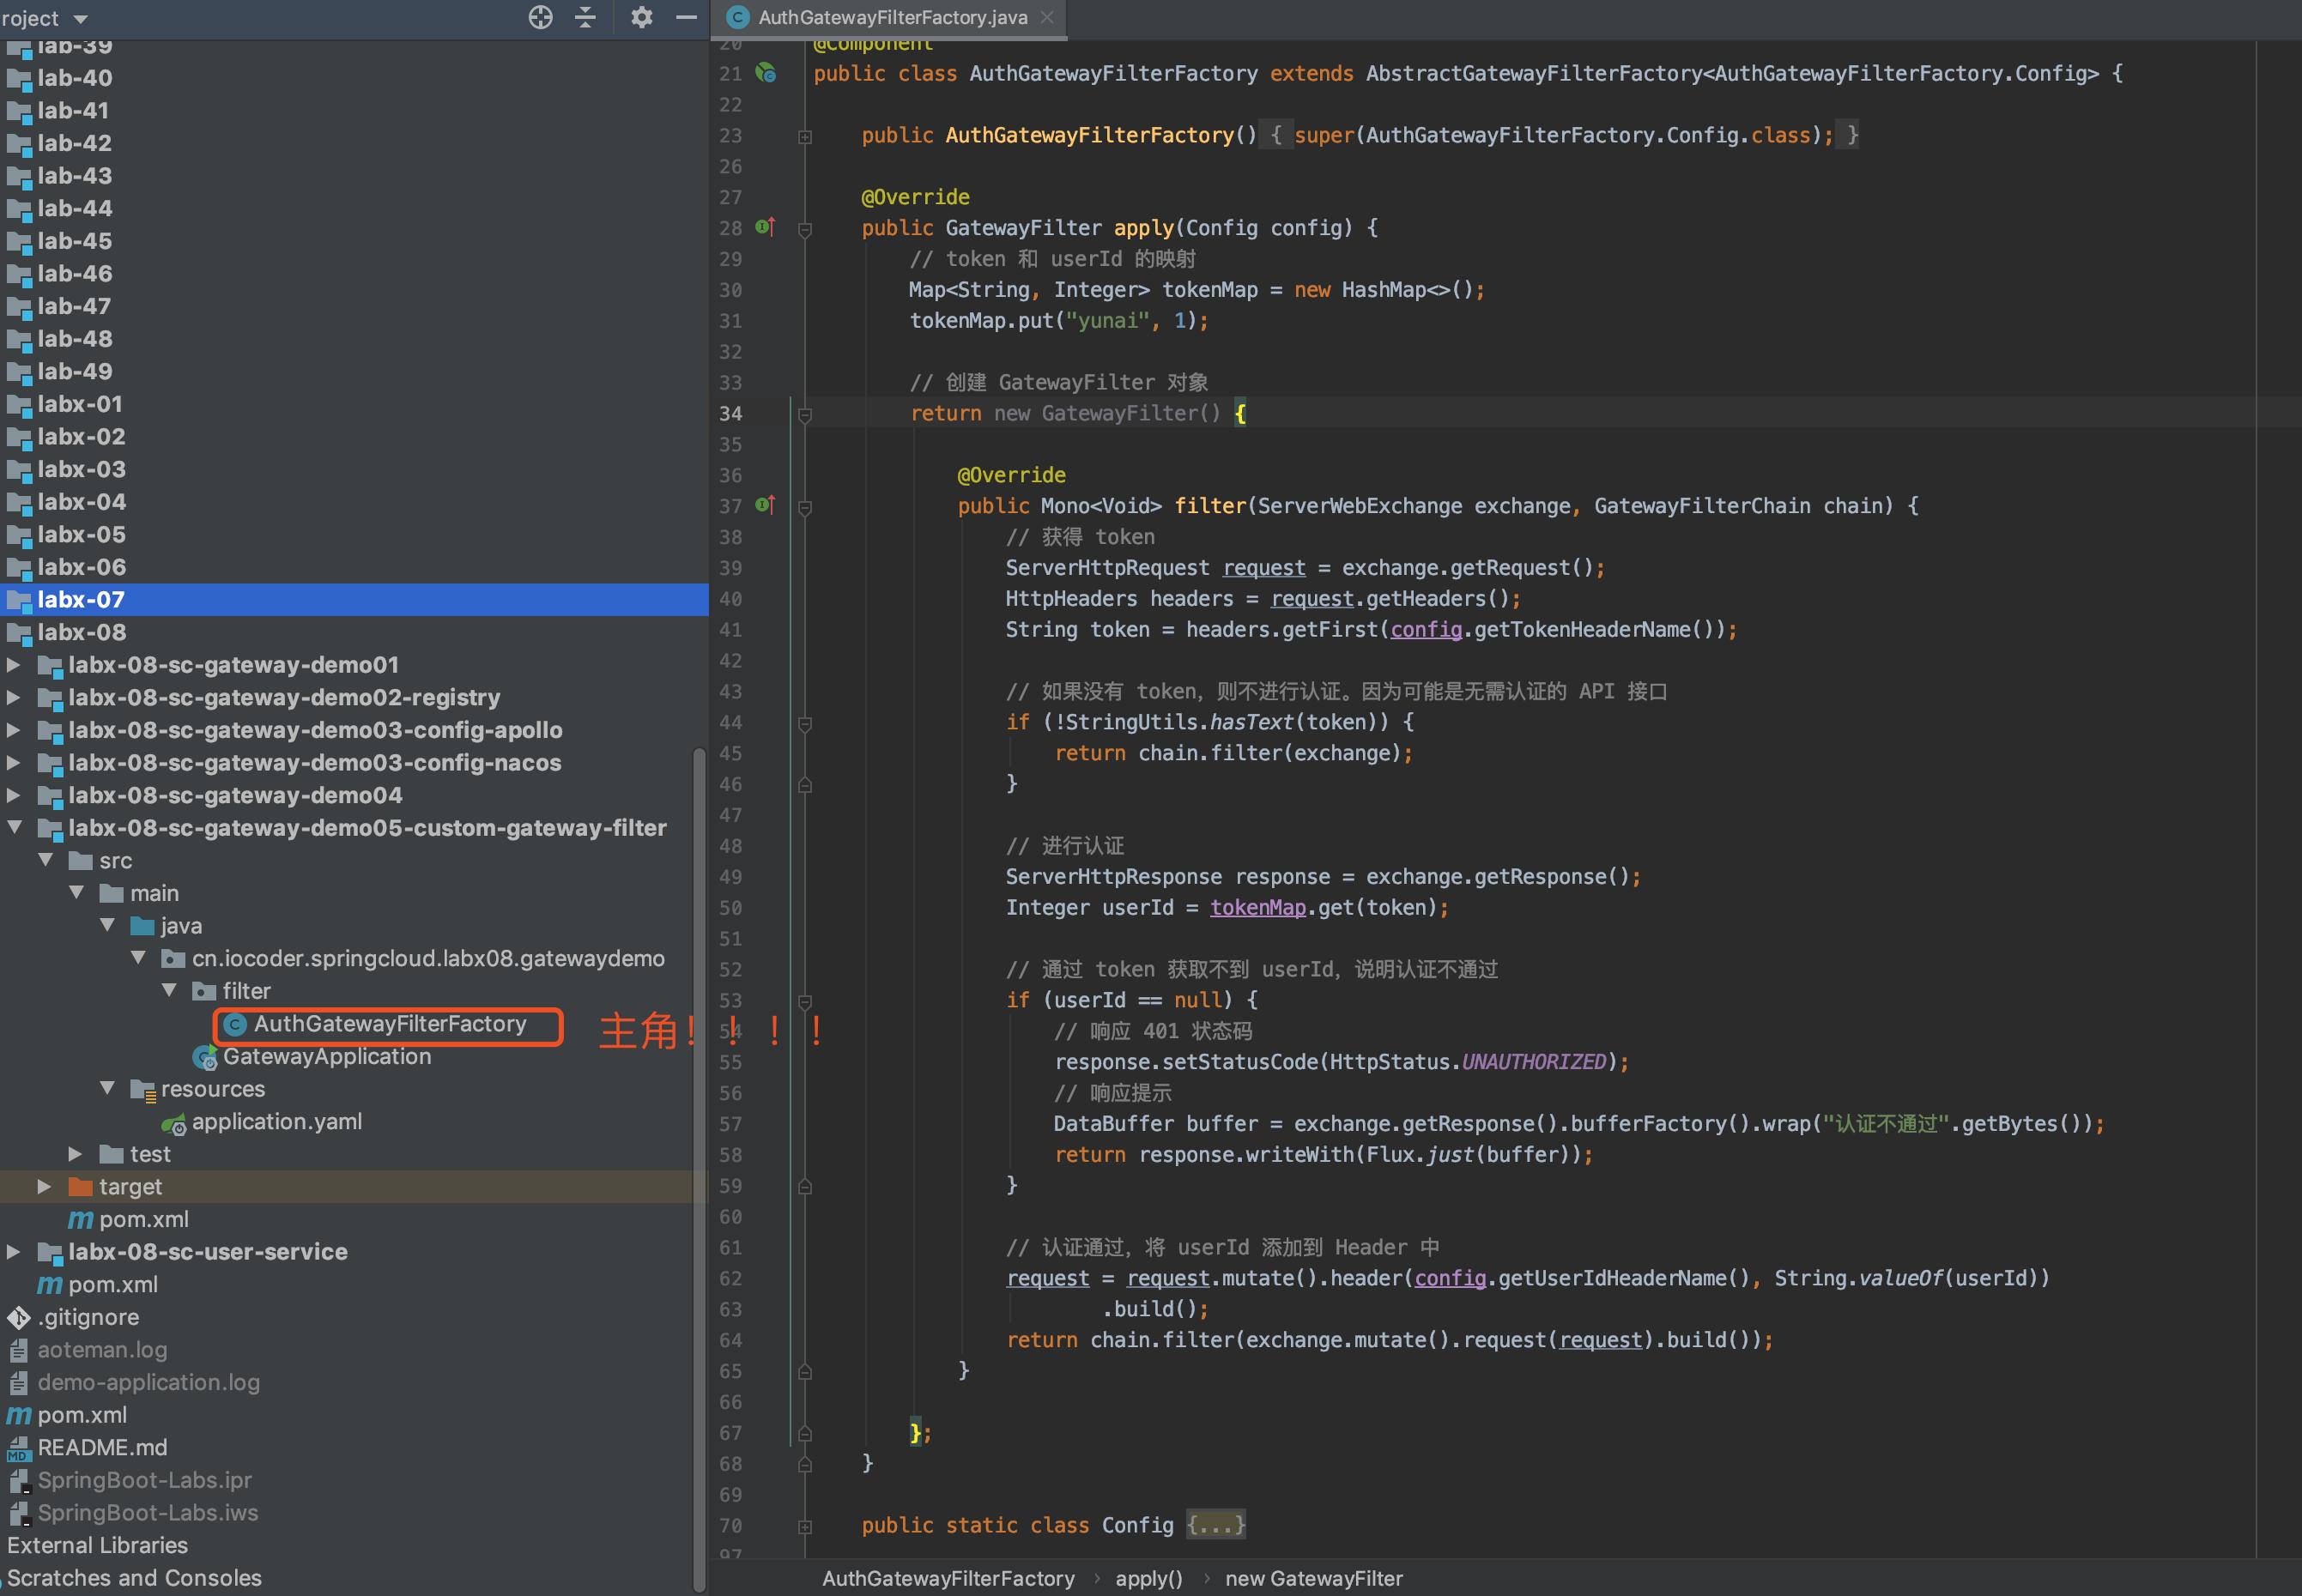 `labx-08-sc-gateway-demo05-custom-gateway-filter` 项目